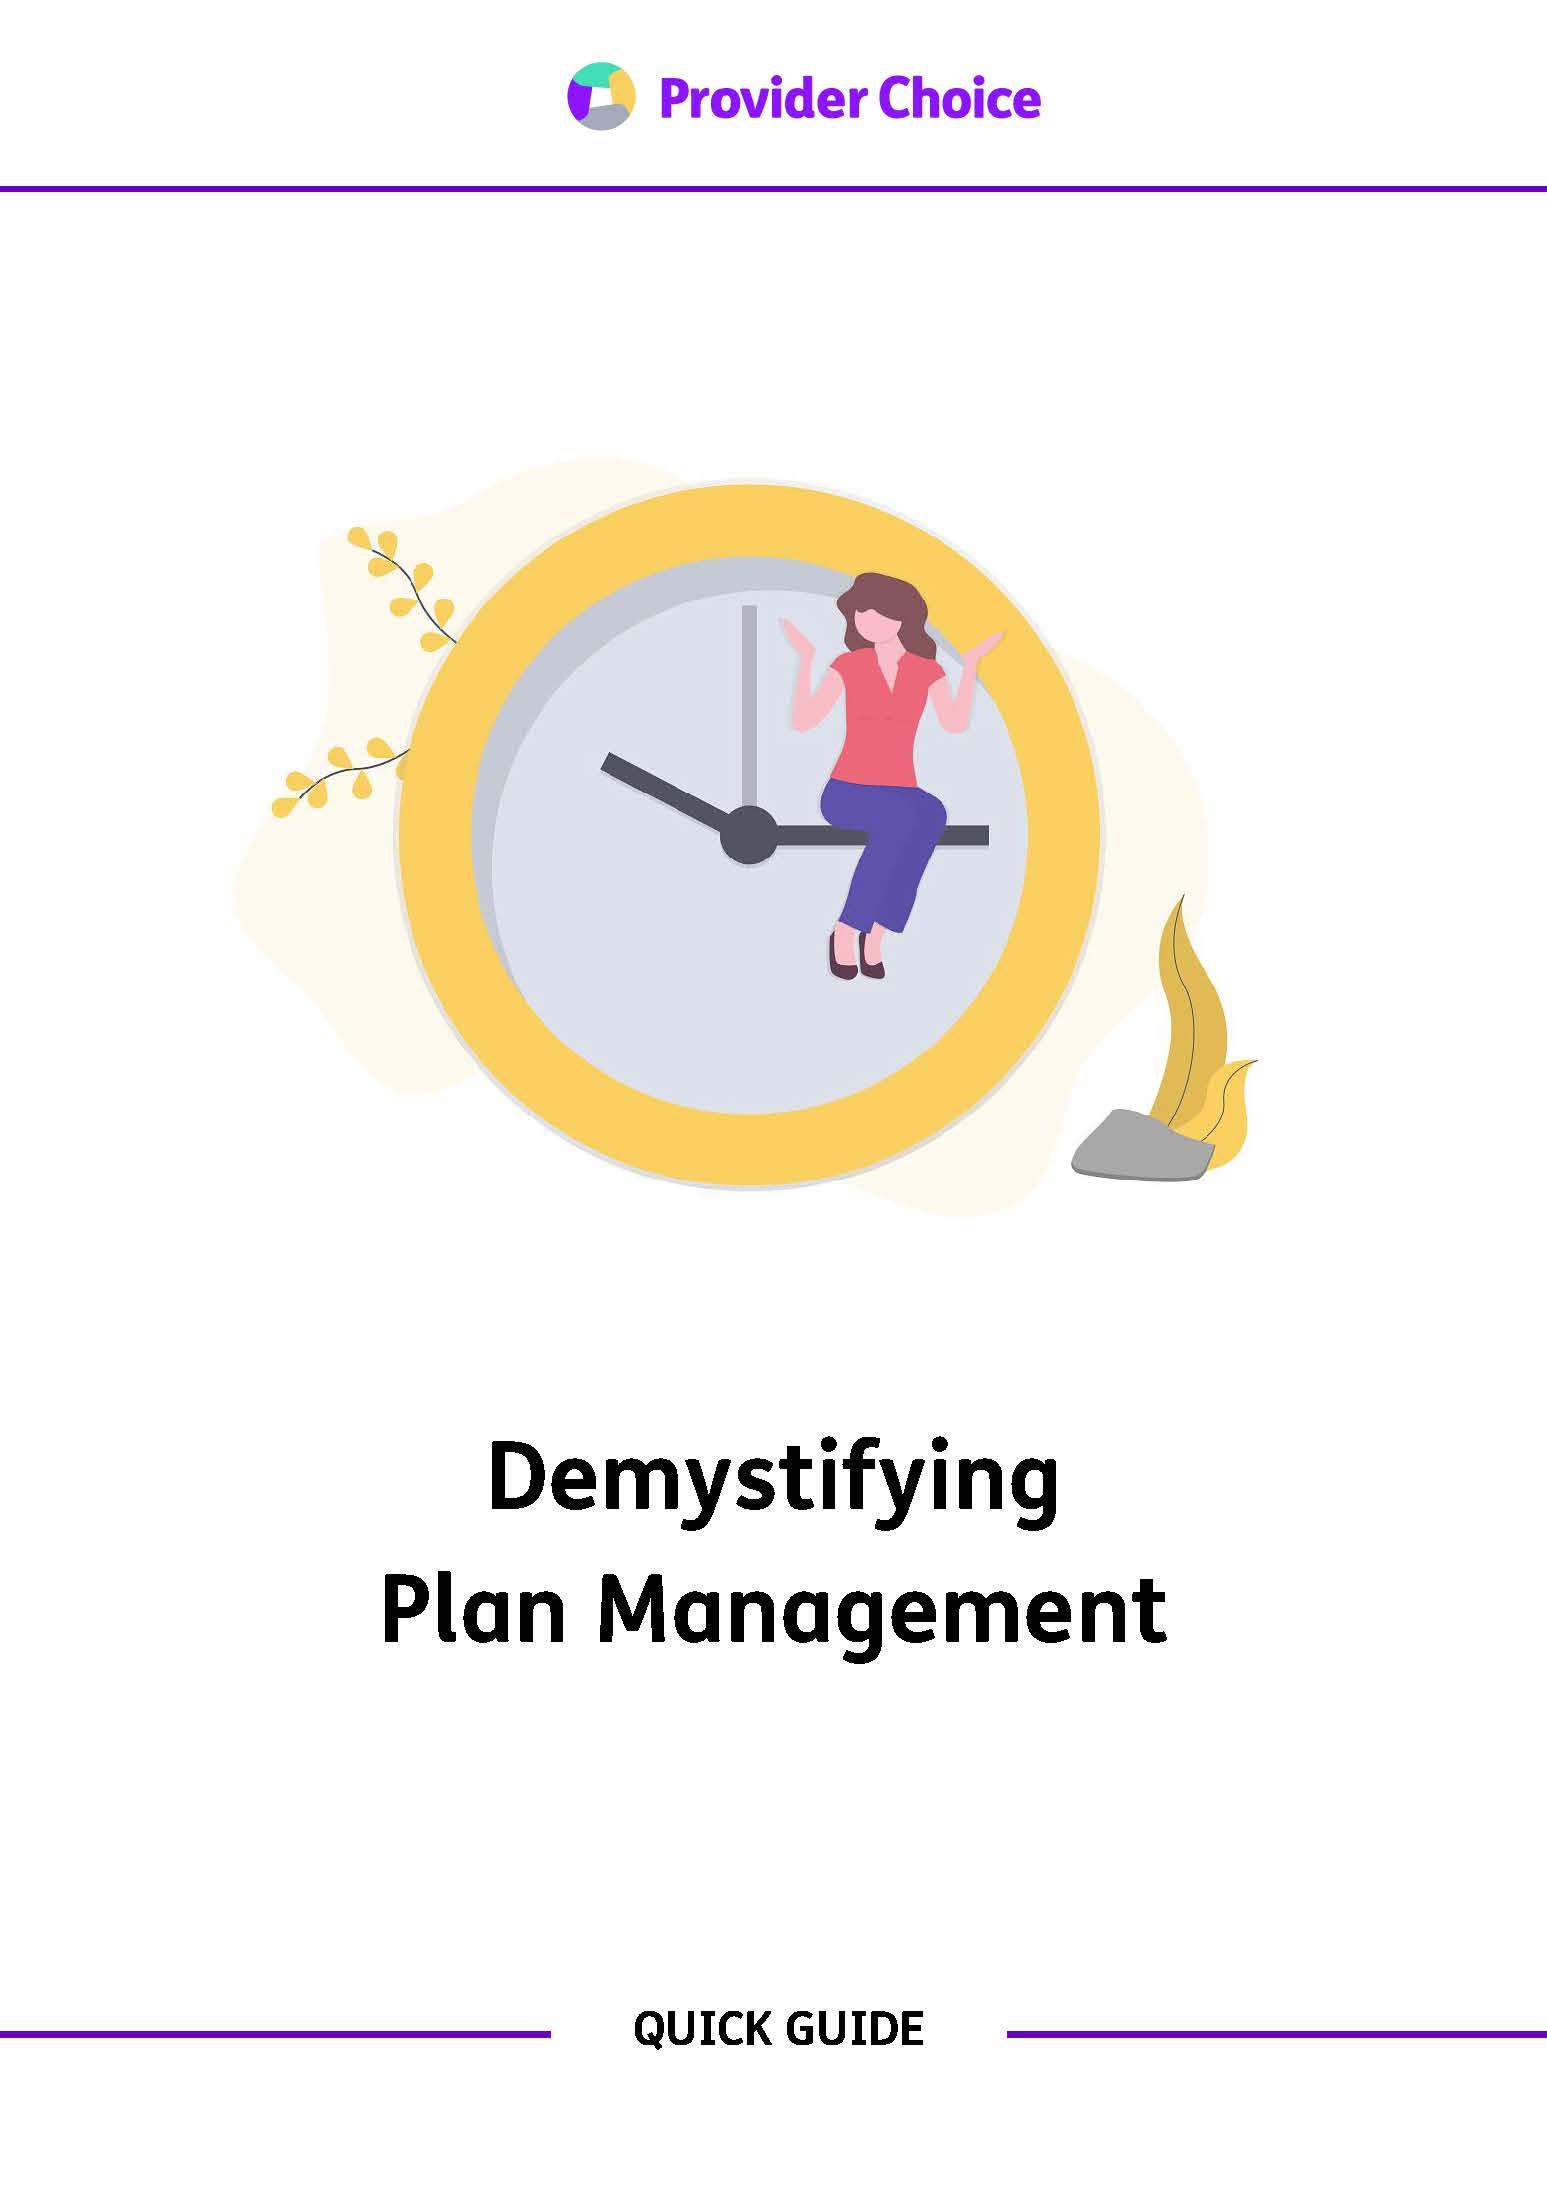 Demystifying Plan Management